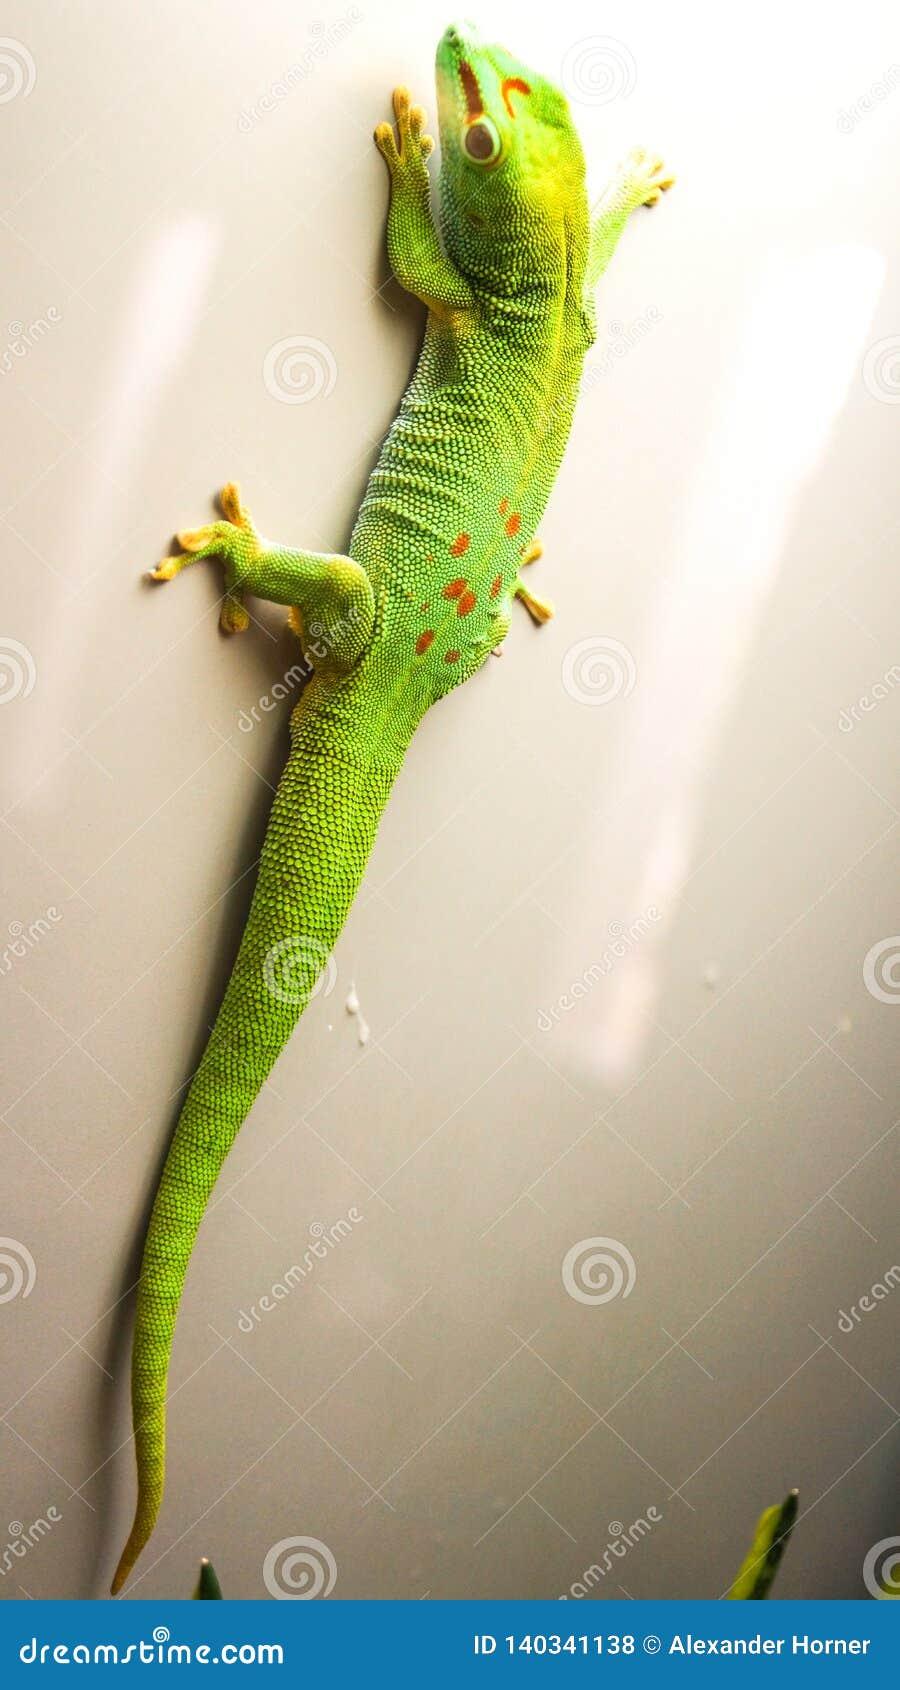 Caroline-Anoliseidechsengrün bunt, Wand oben kletternd